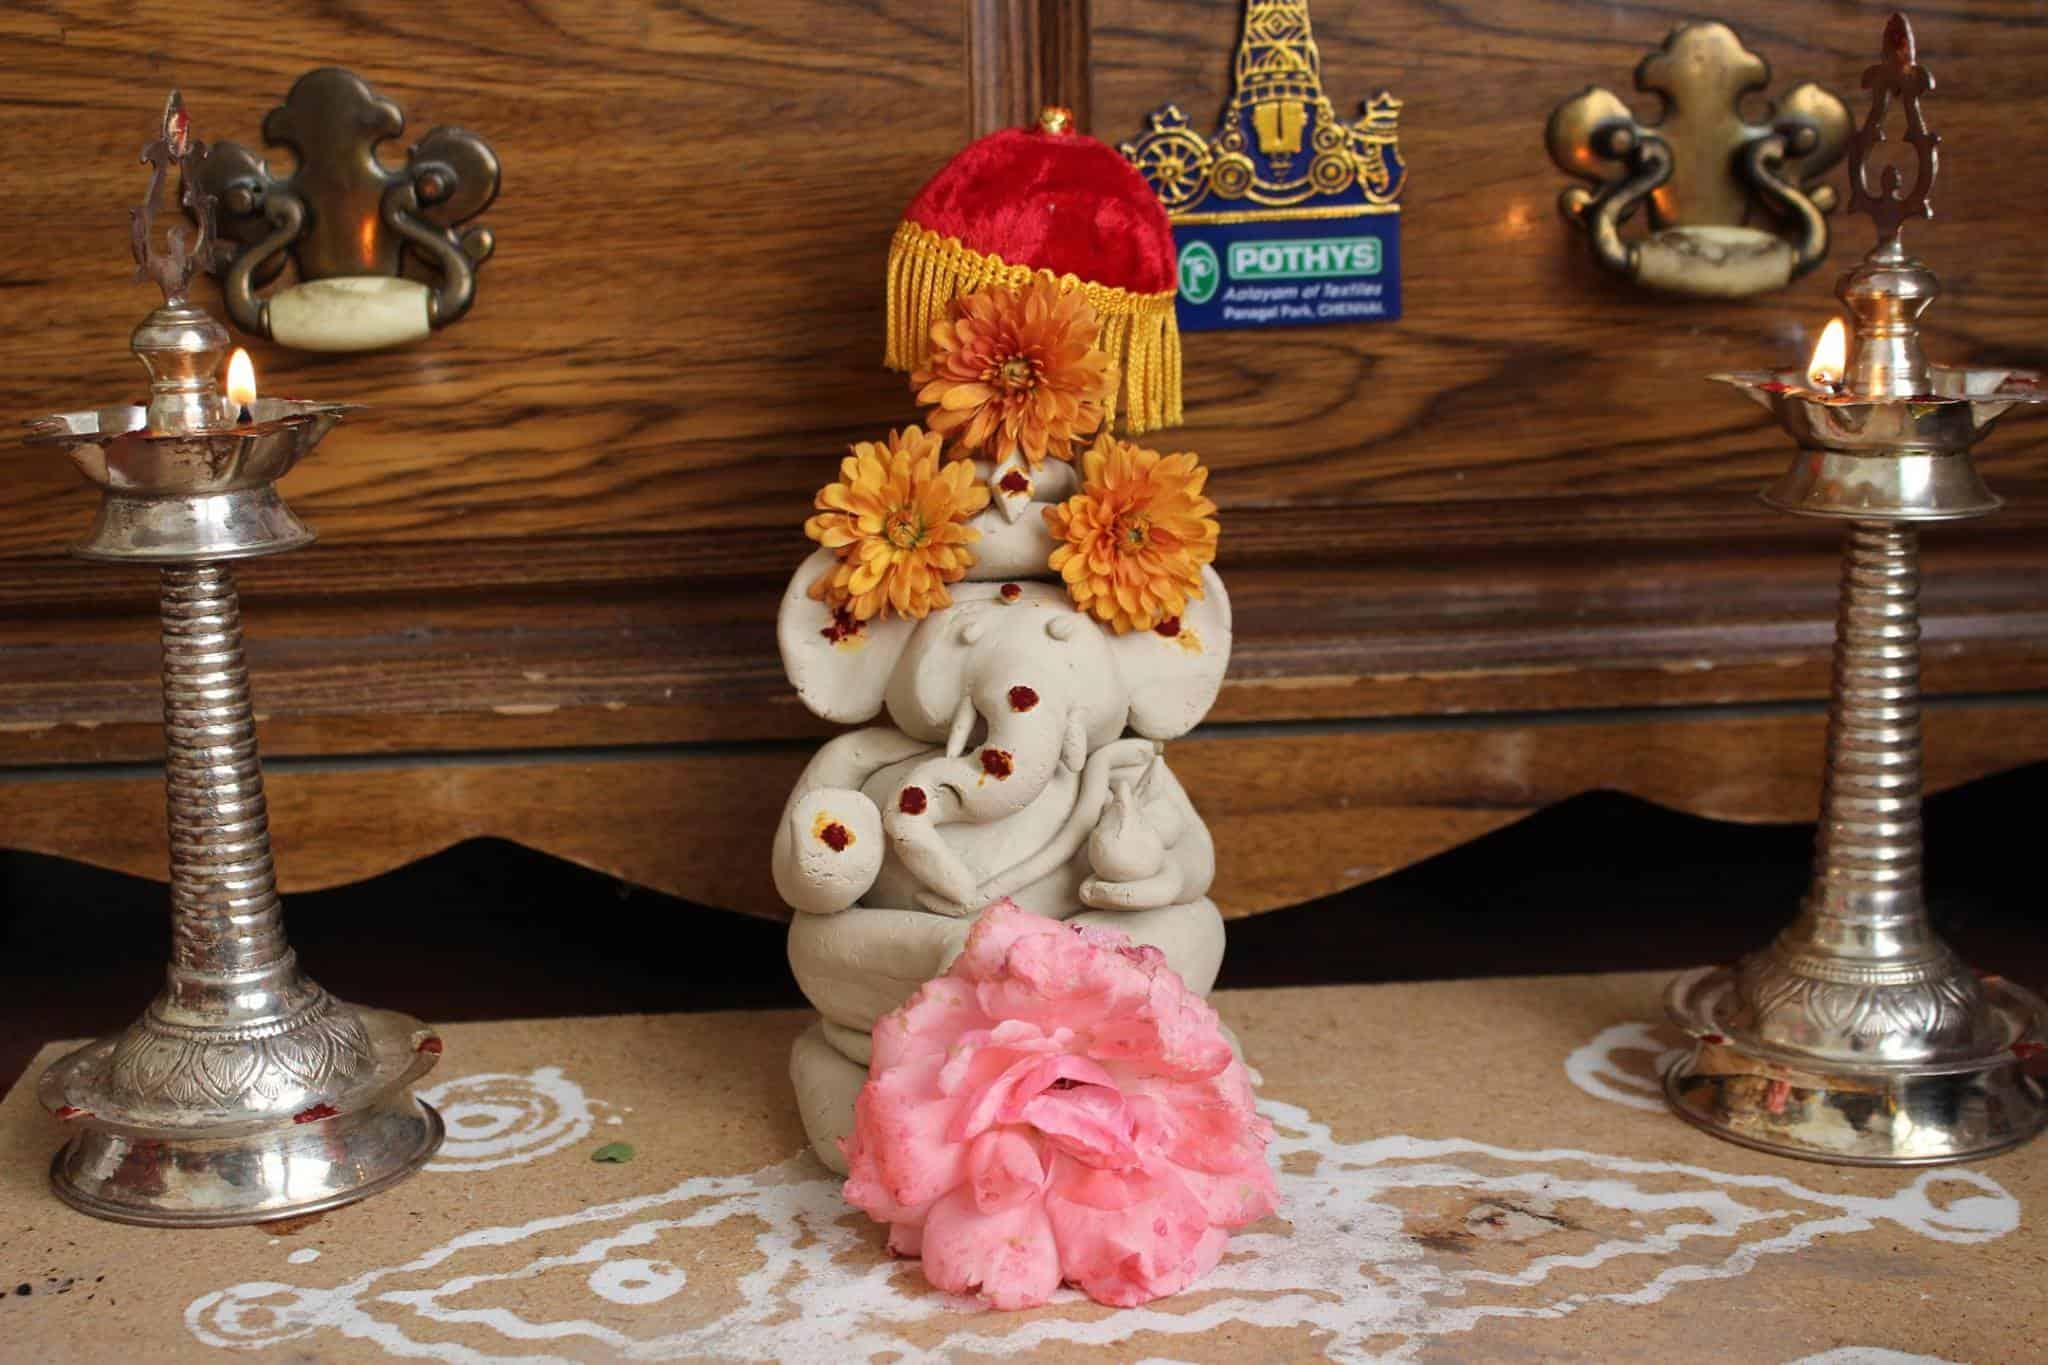 Vinayaga Chaturthi / Pillayar Chaturthi / Ganesha Chaturthi Recipes